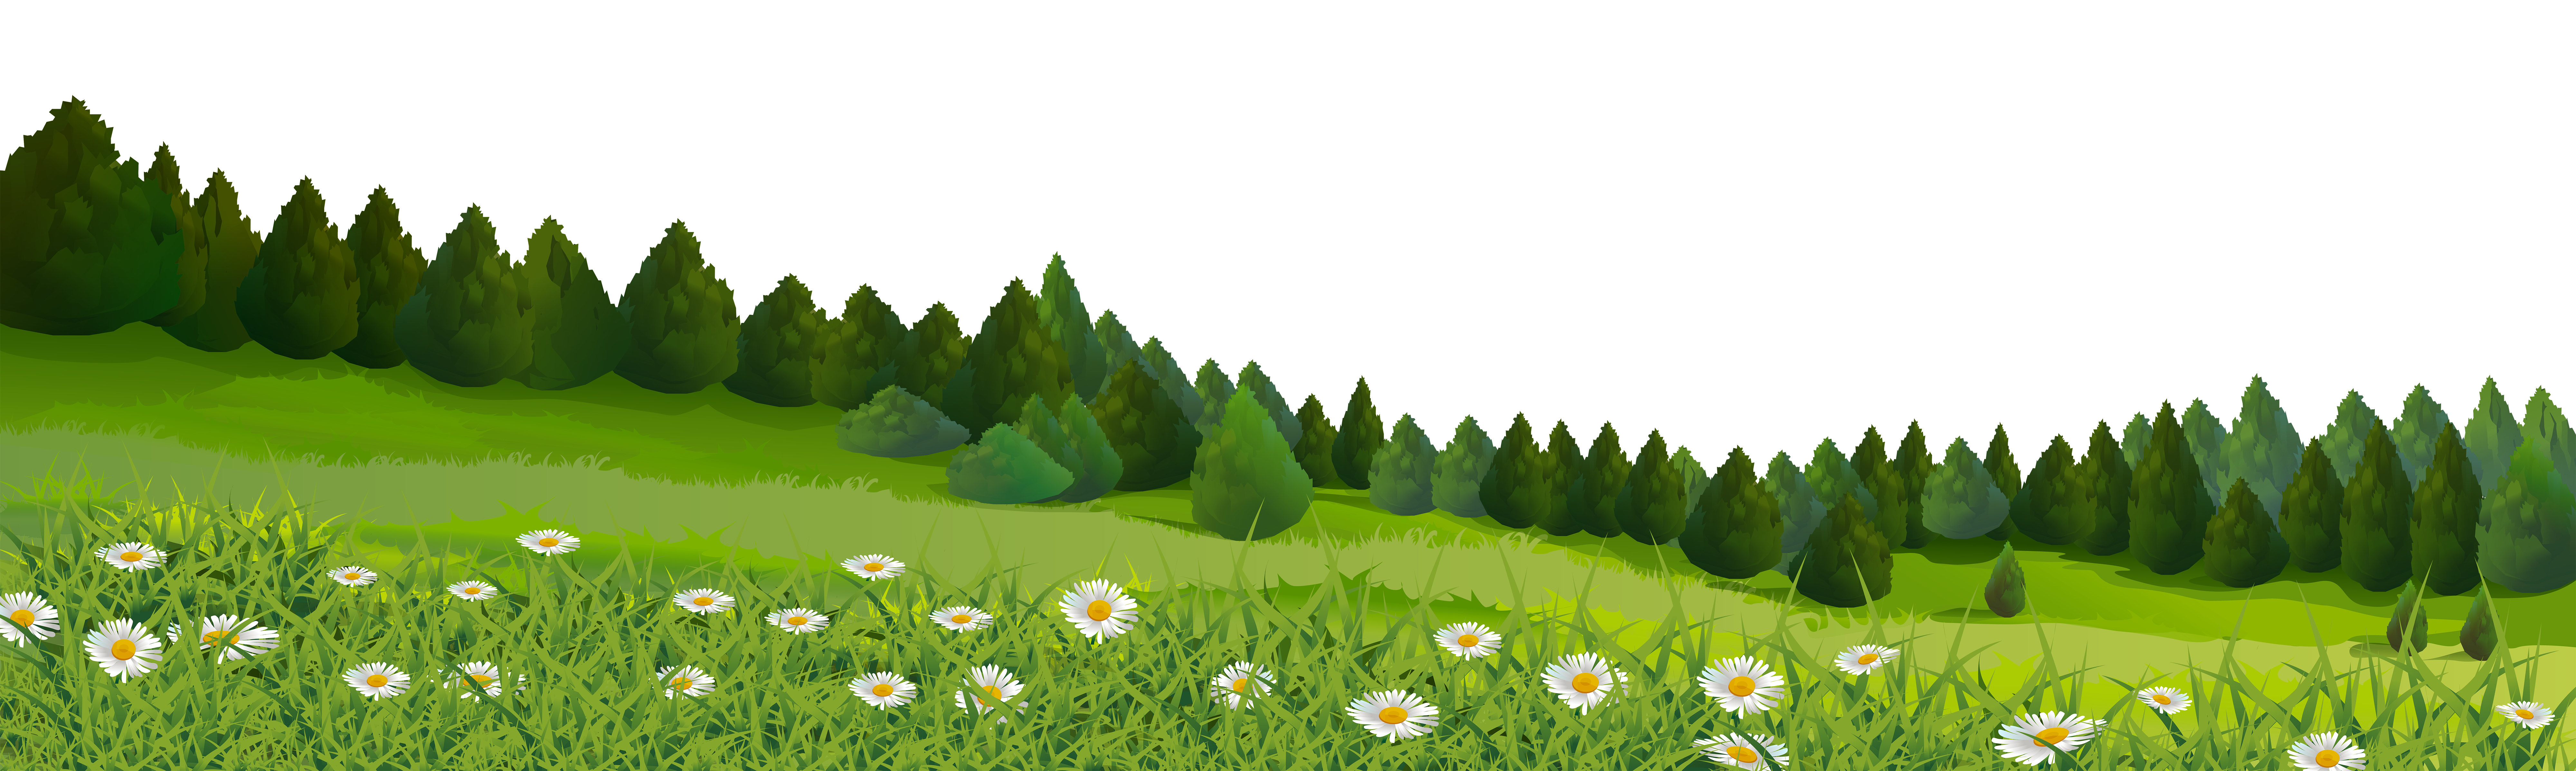 Lawn clip art trees. Land clipart grassland biome